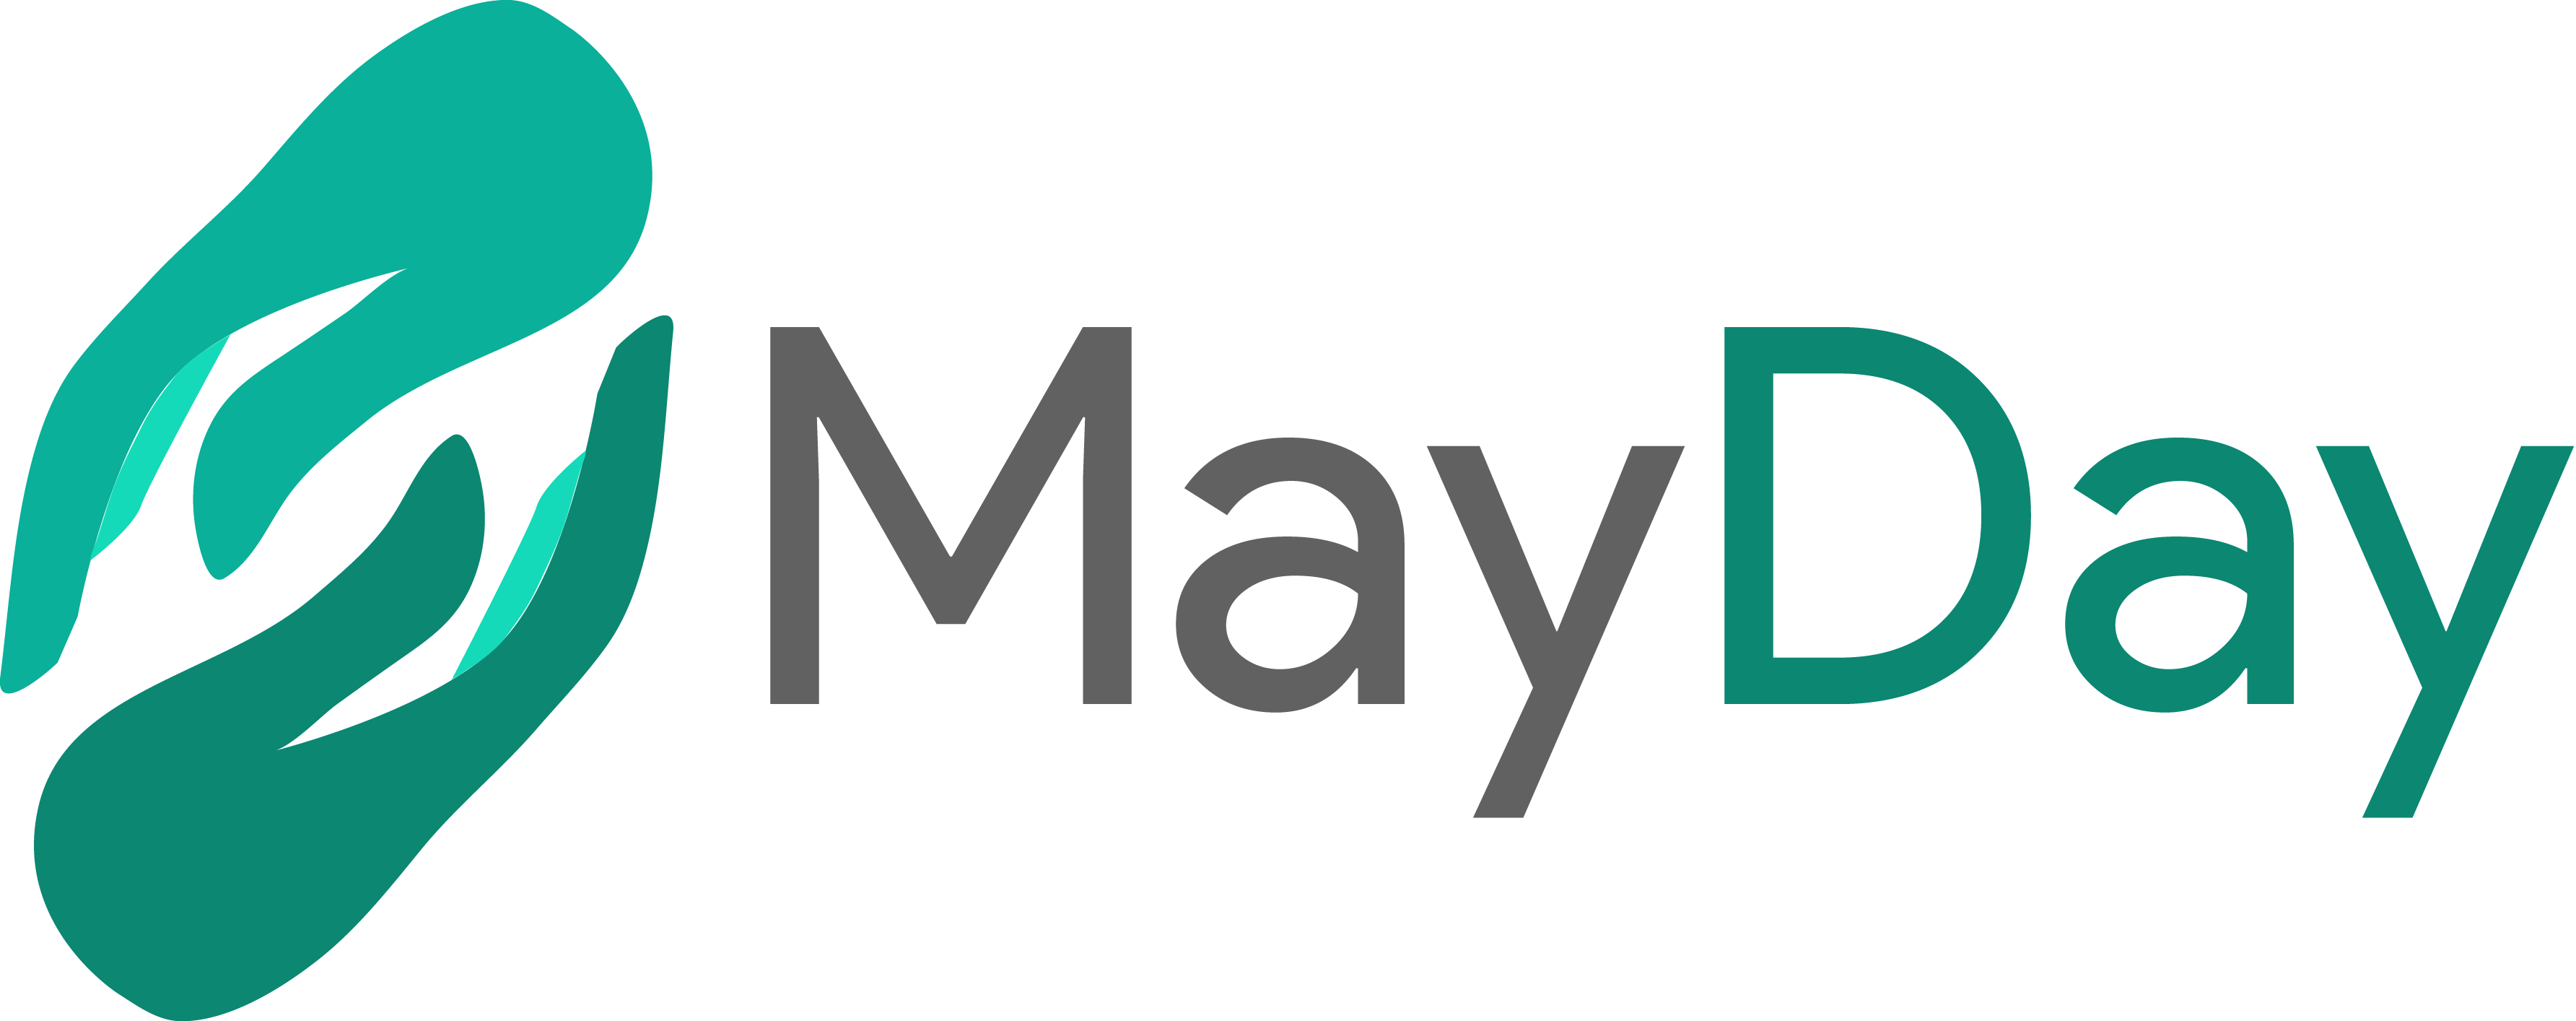 Mayday (formerly Covid-19 Tracker)